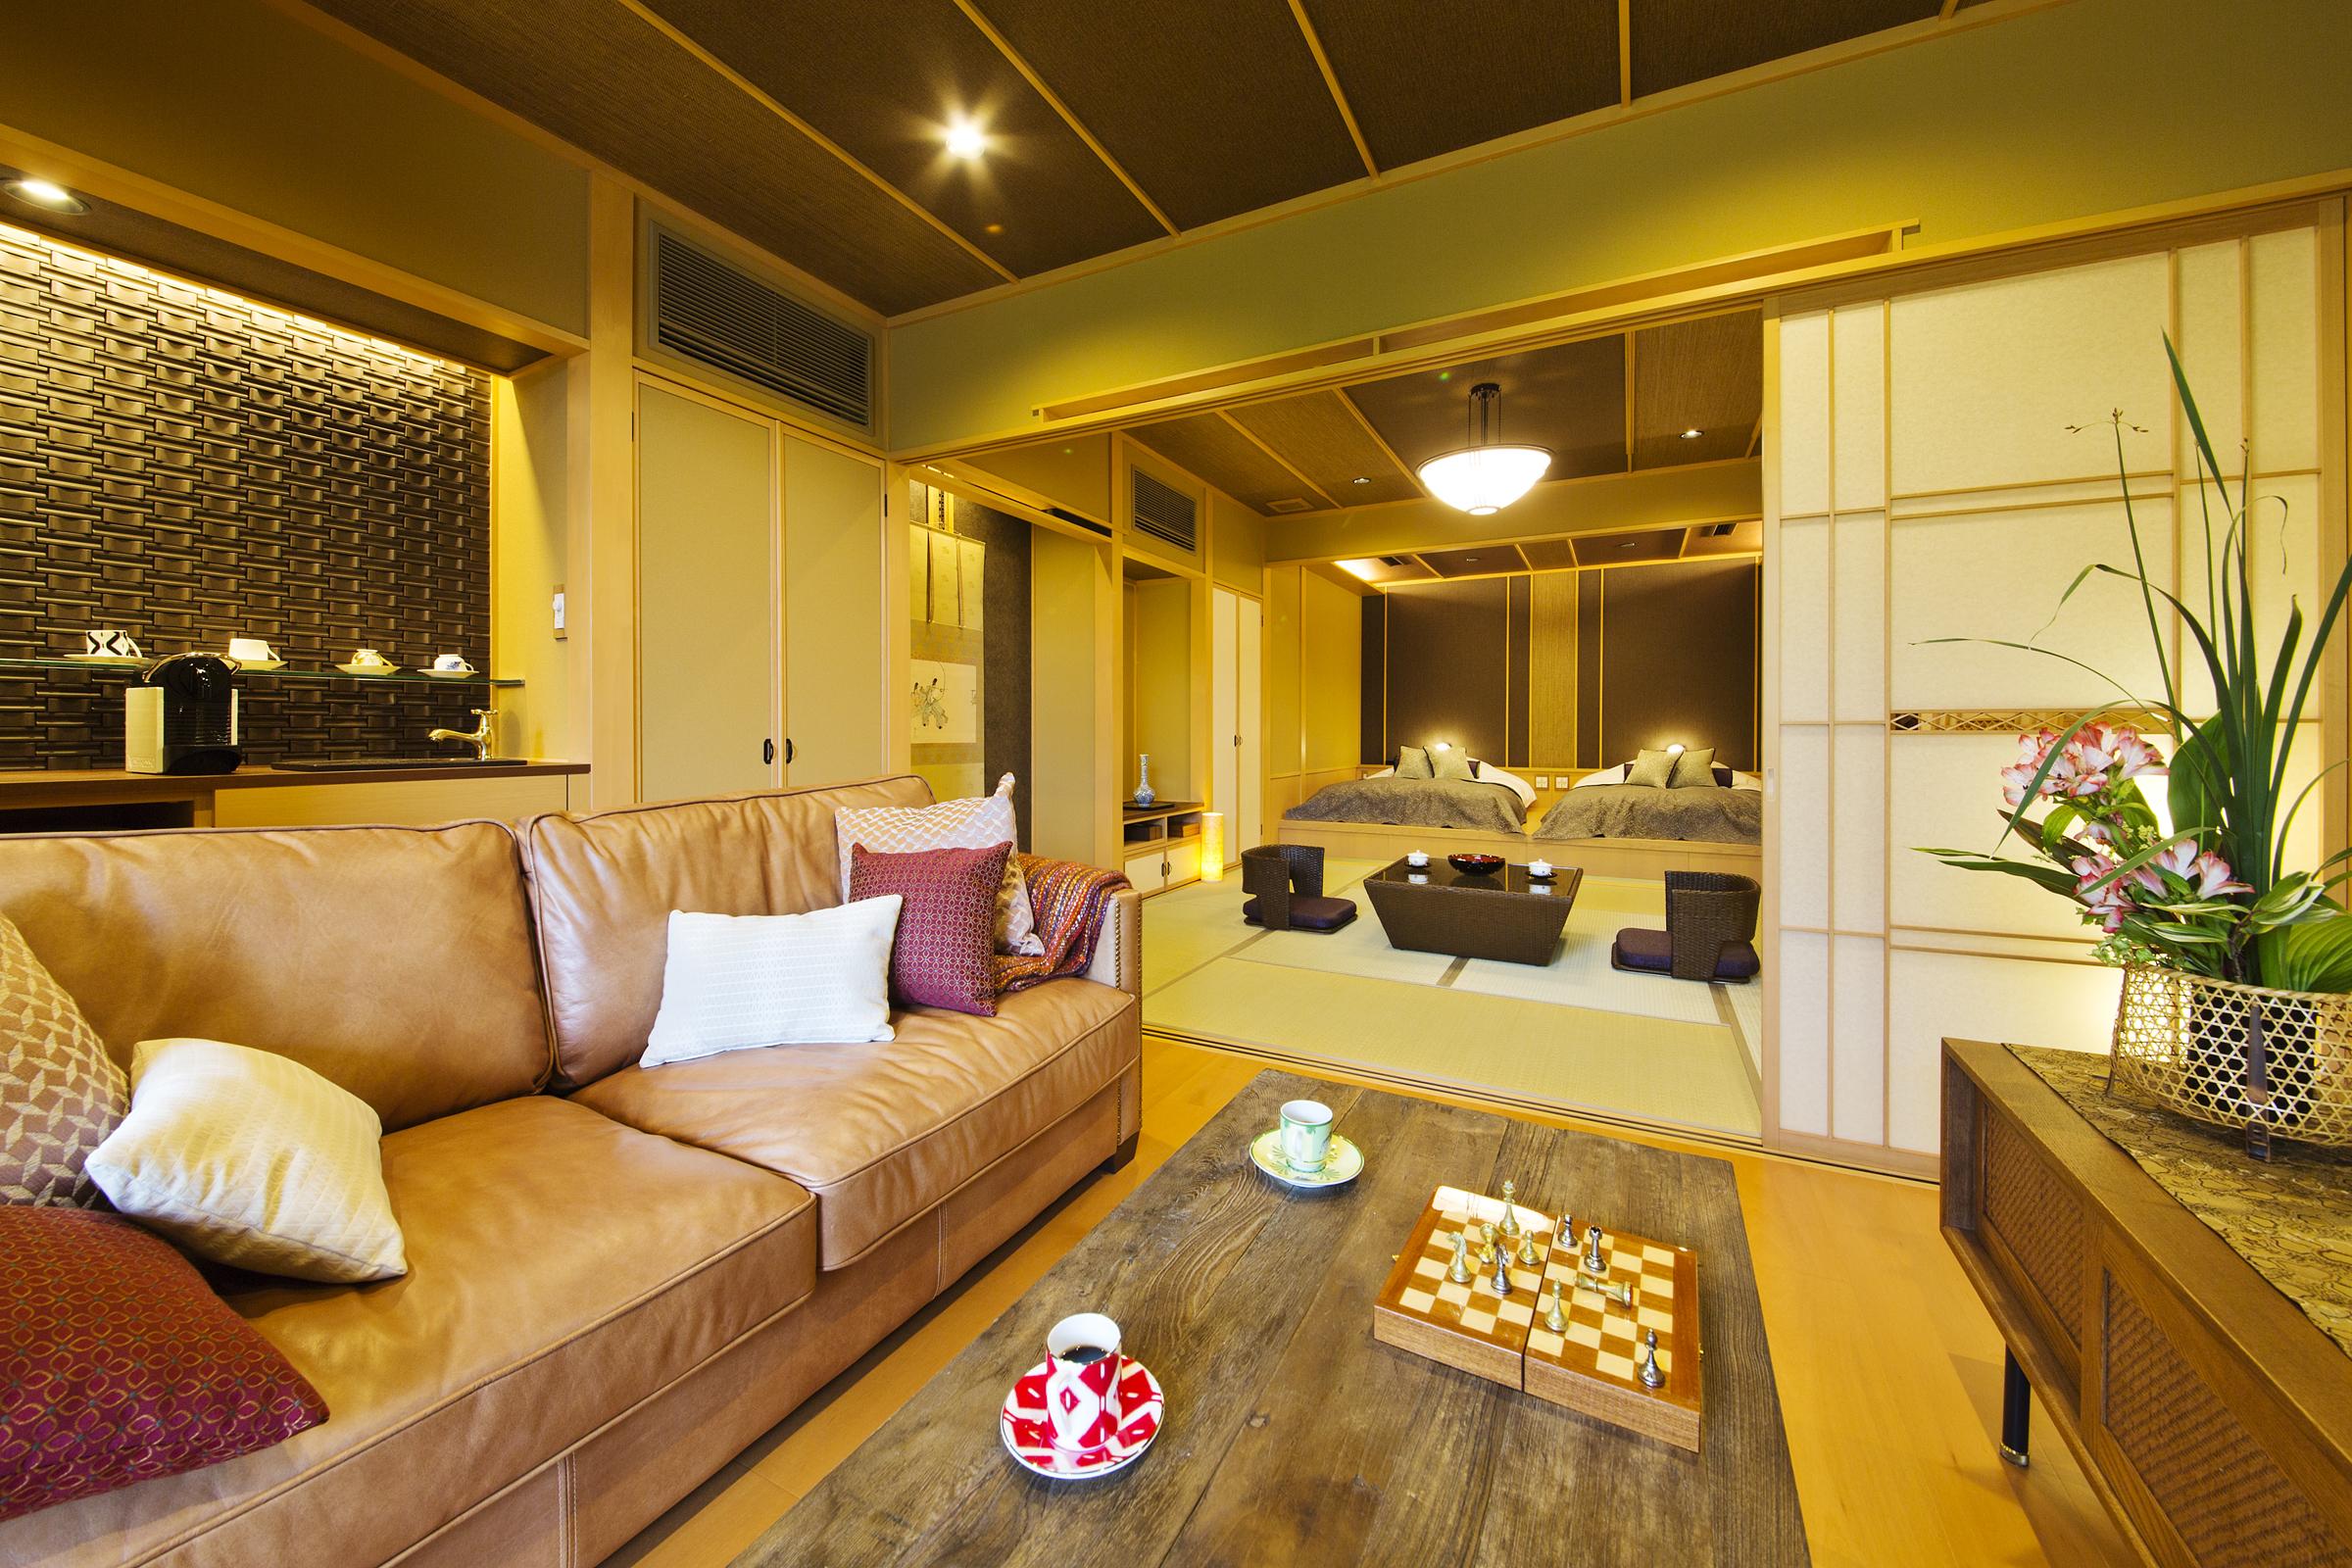 [360泊]6連泊(日~金)×60週 Jr.和スイート(客室露天付) 1名利用プラン